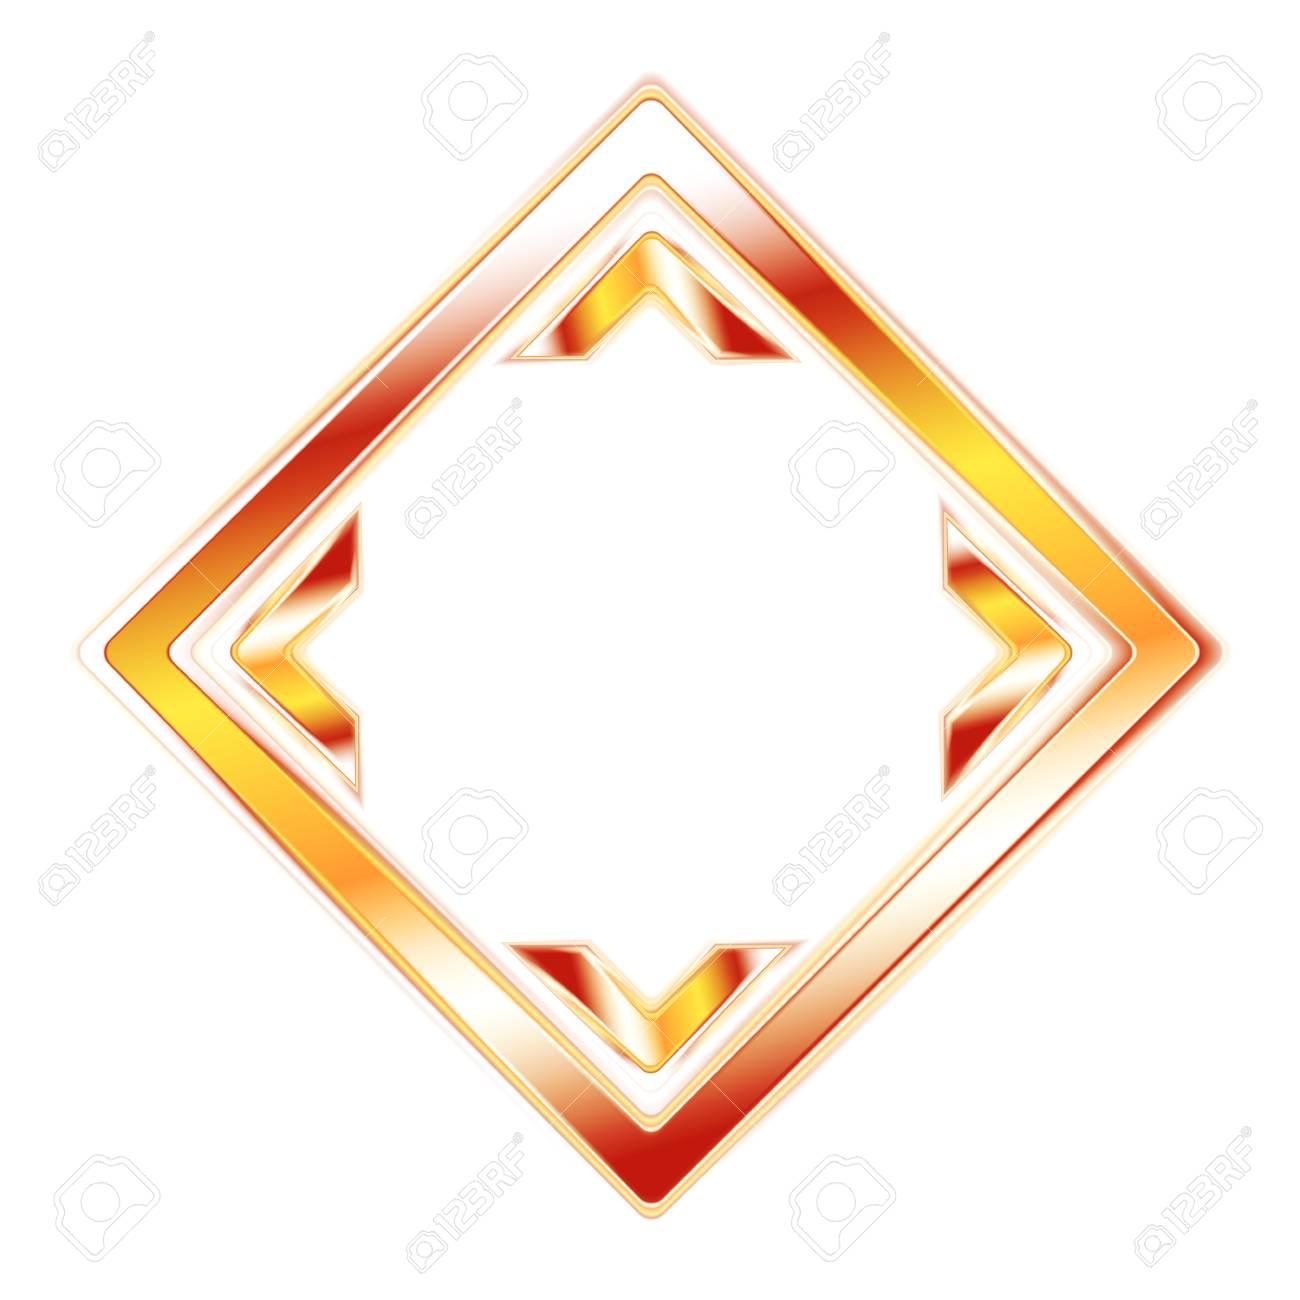 Abstract elegant orange shape. Stock Vector - 17970677